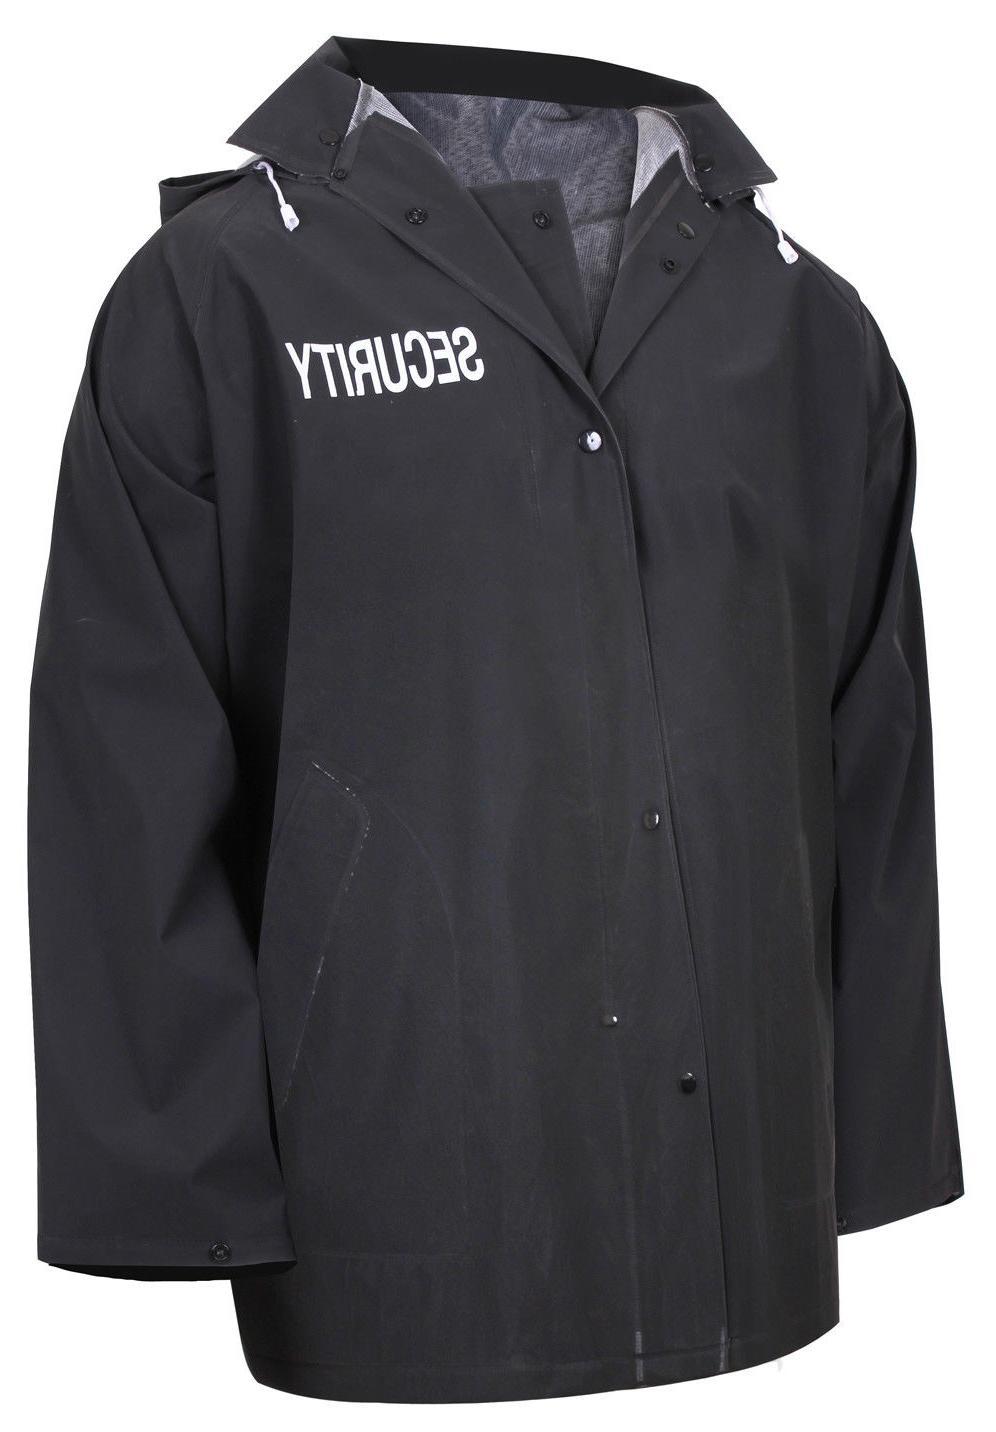 Security Officer Event Security Rain Jacket w/ Hood Black Se